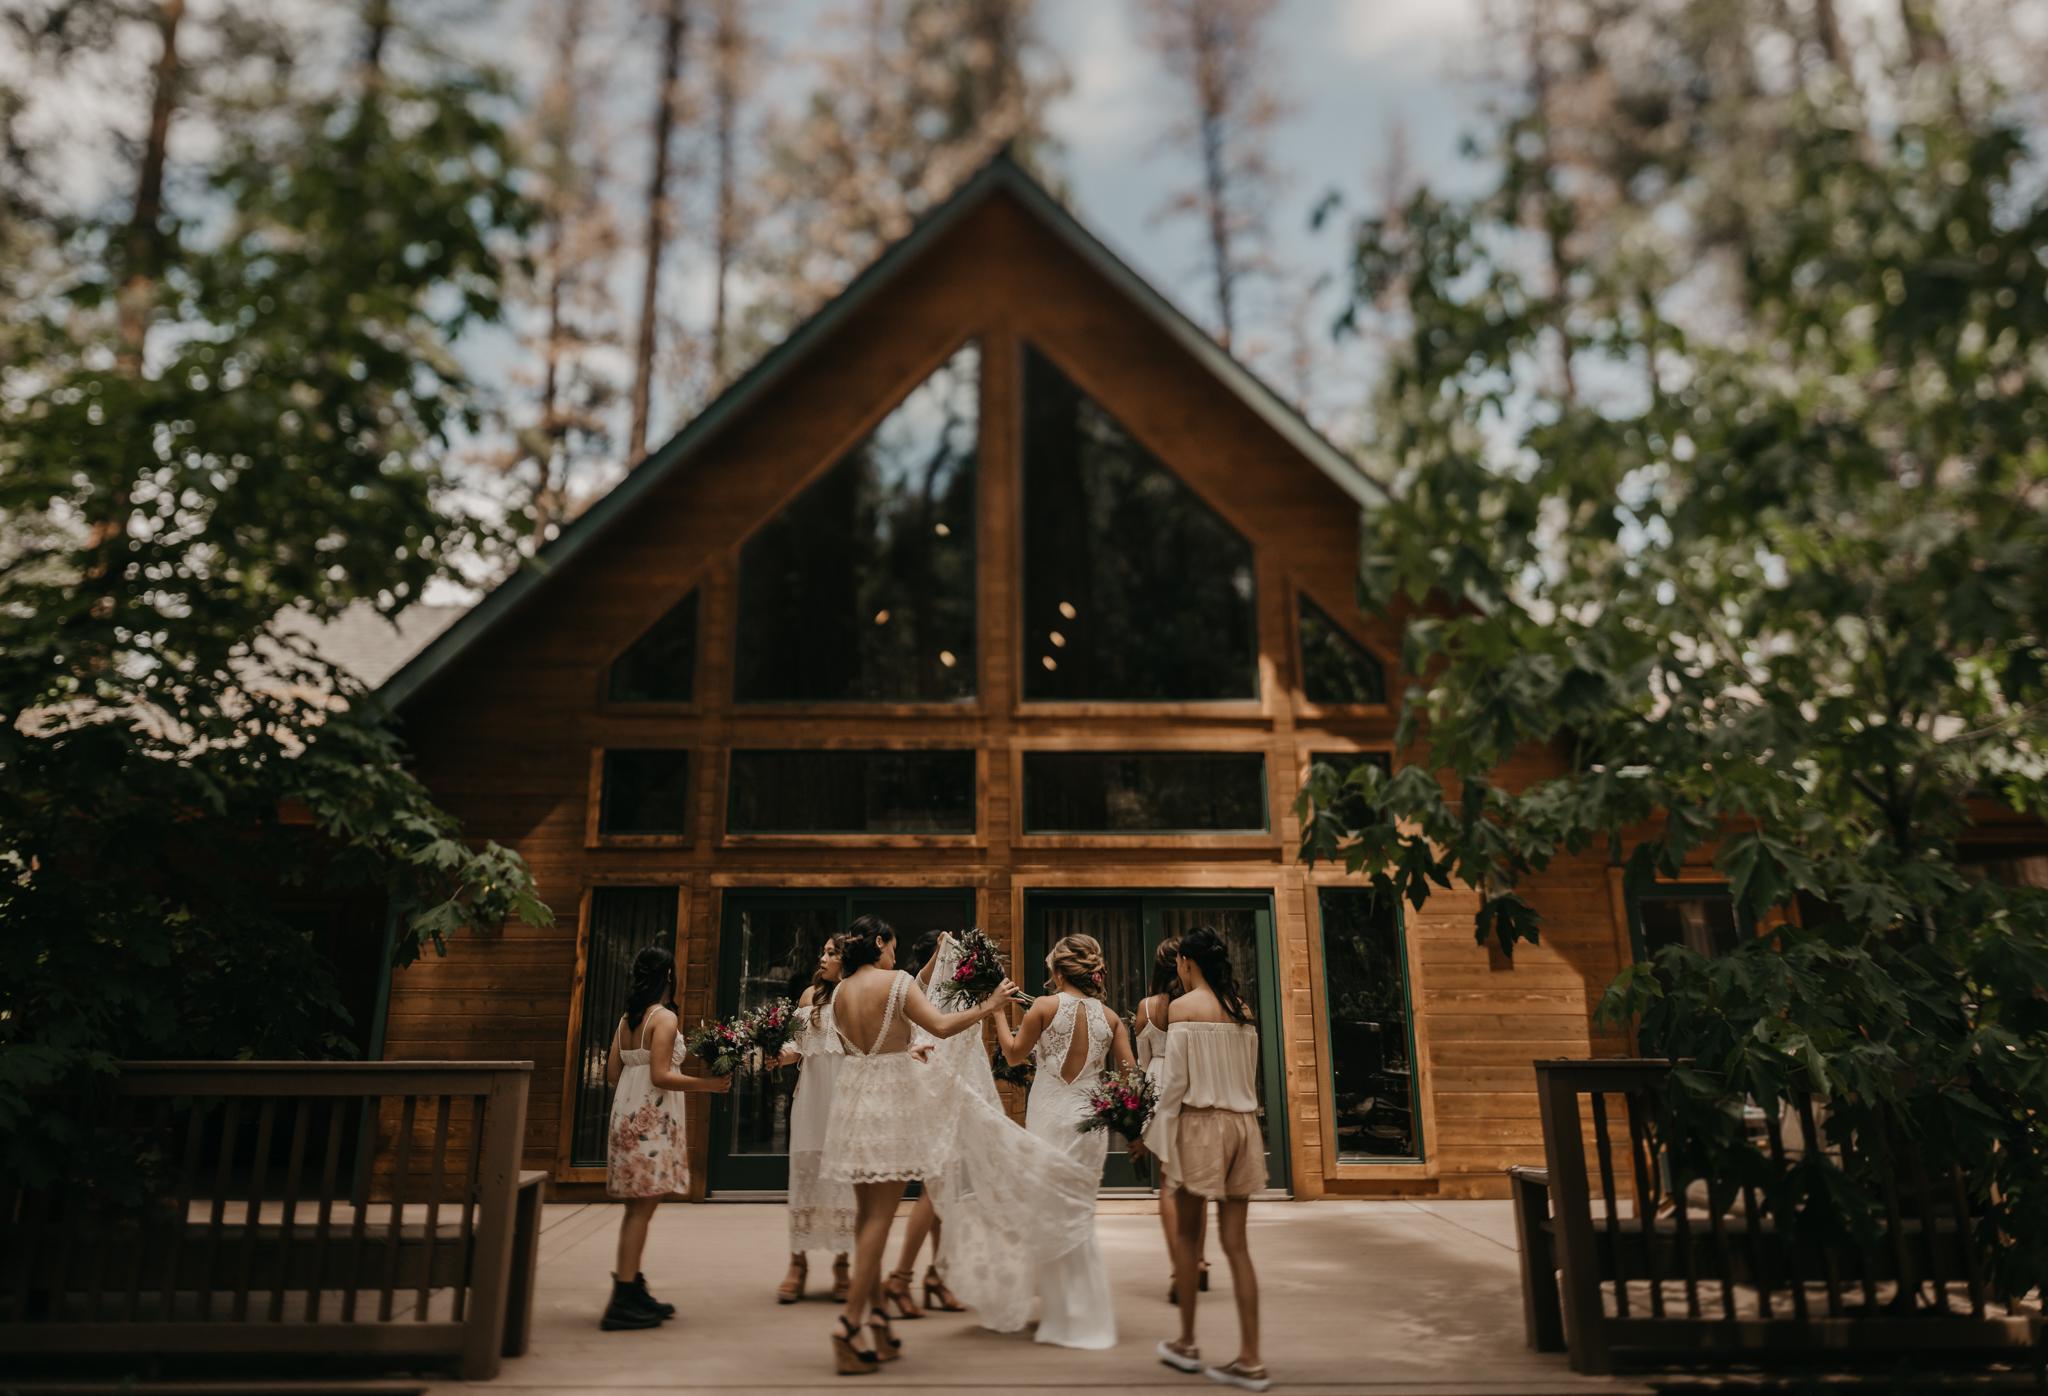 © Isaiah + Taylor Photography - Evergreen Lodge Destination Yoesmite Wedding - Los Angeles Wedding Photographer-057.jpg